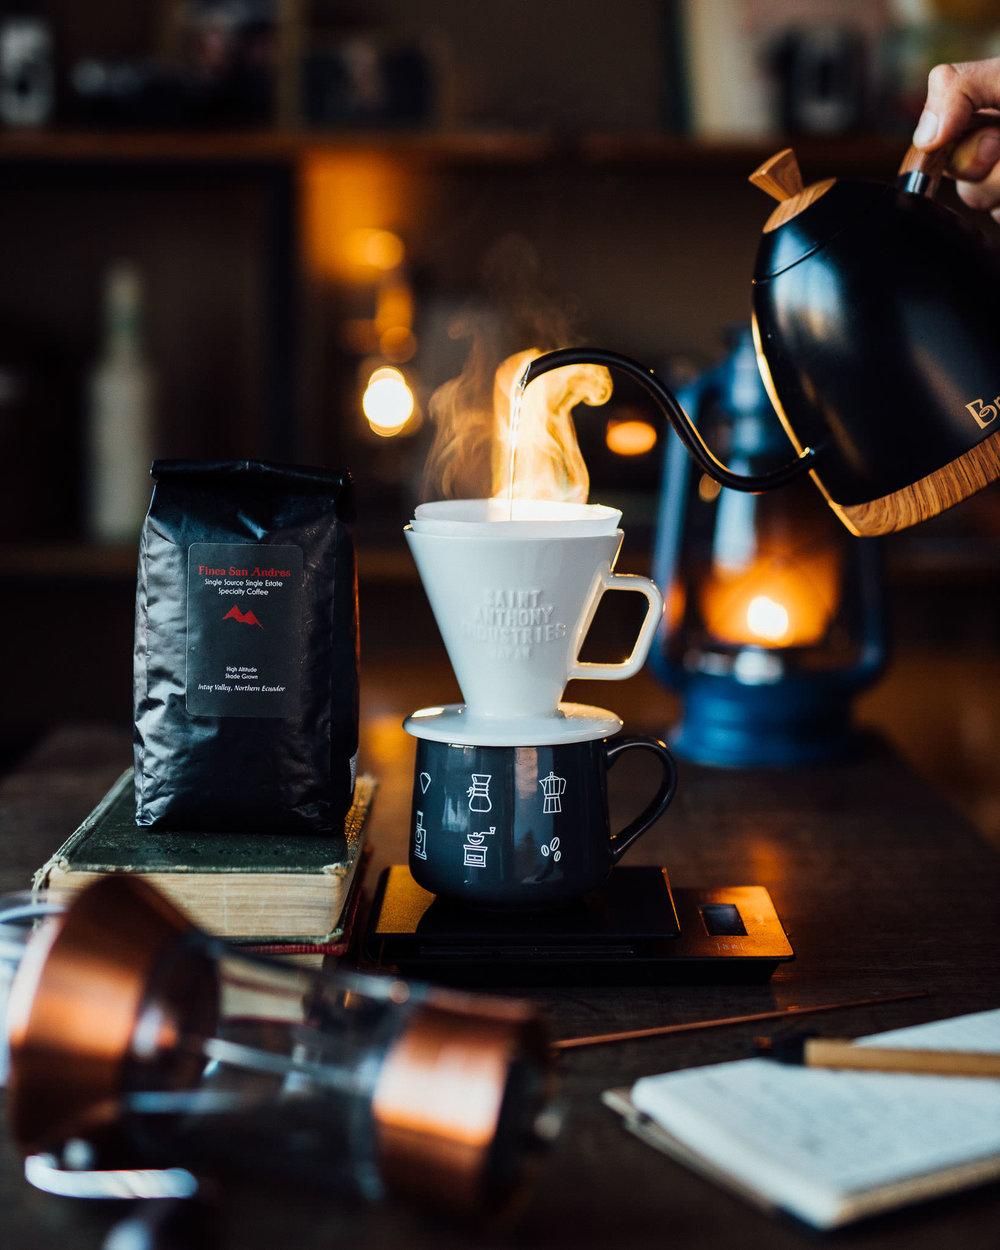 Pour over C70 coffee dripper Finca San Andres single origin coffee from Ecuador